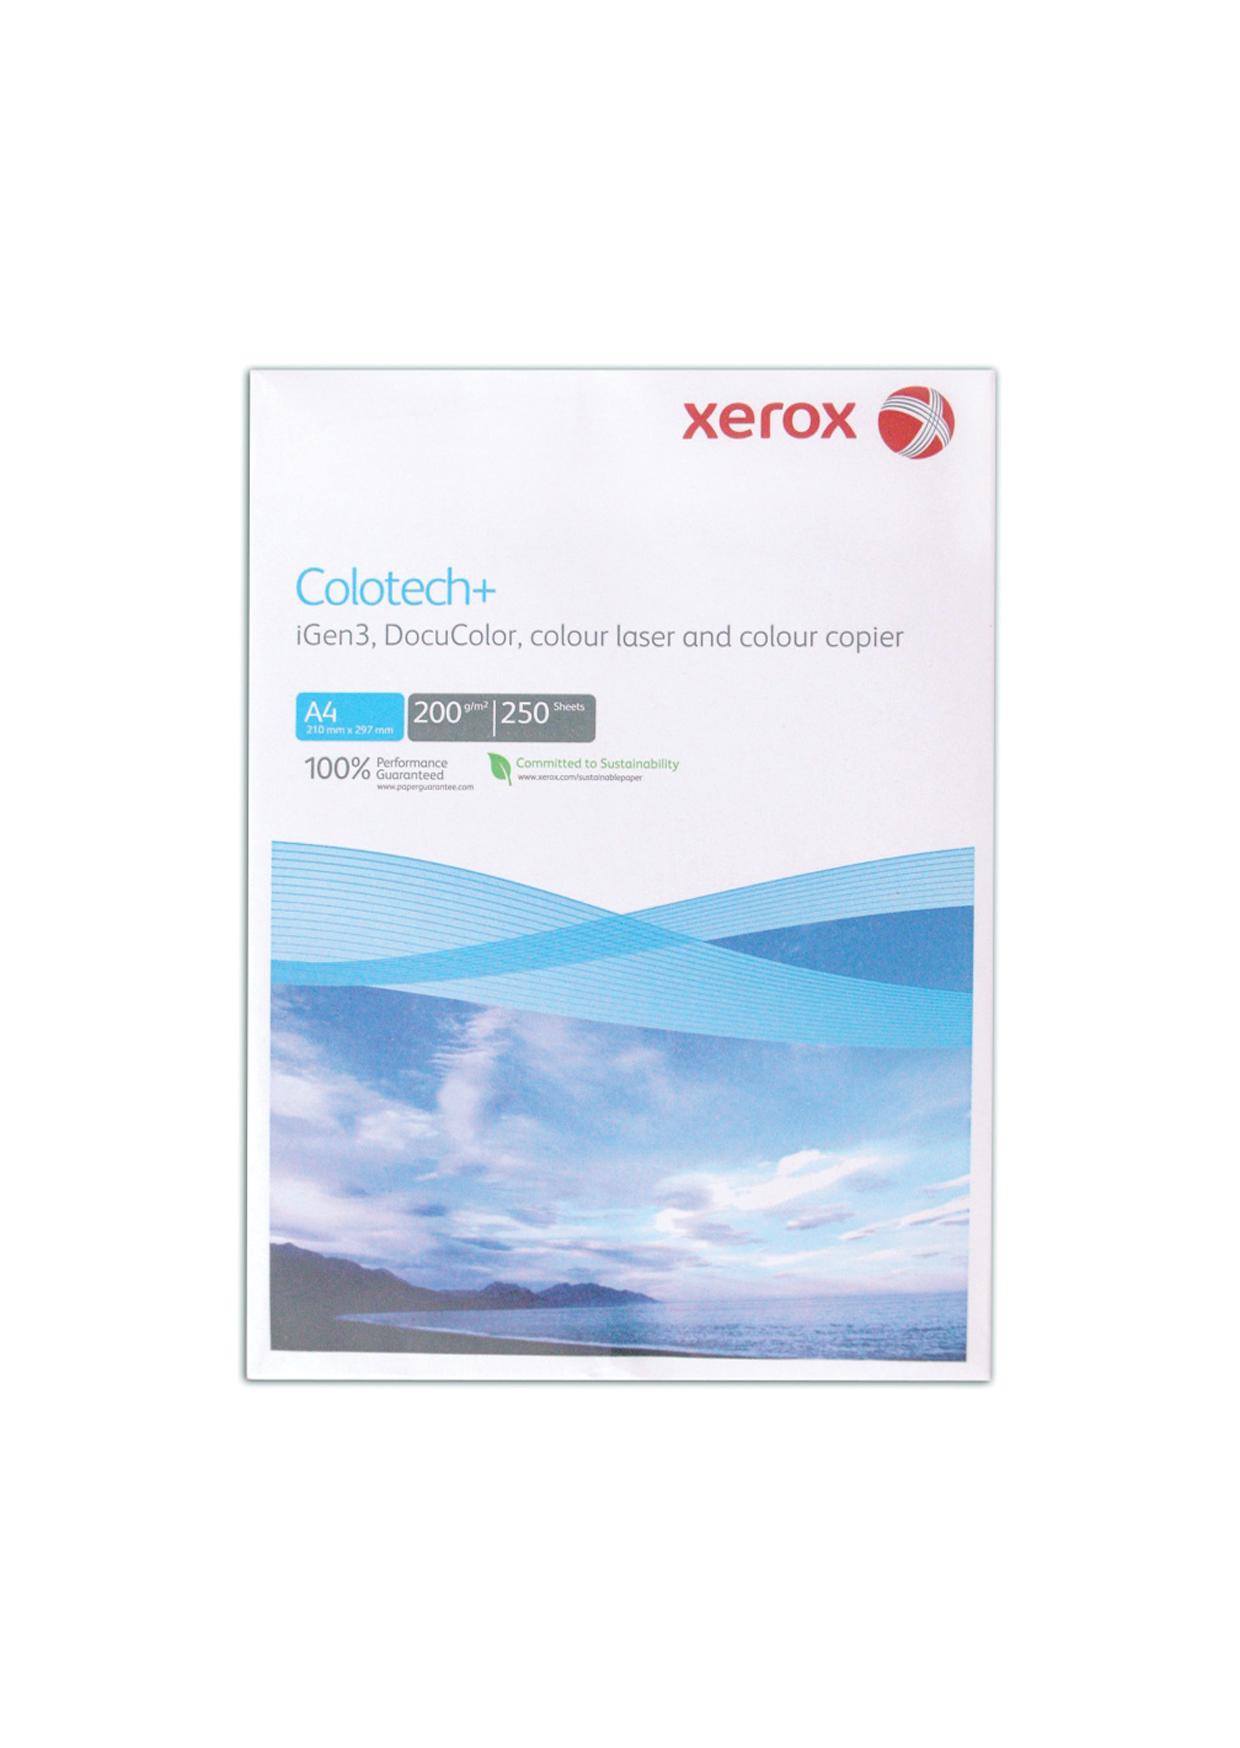 Копирна хартия Xerox Colotech+ SRA3 500 листа 90g/m2 160 CIE